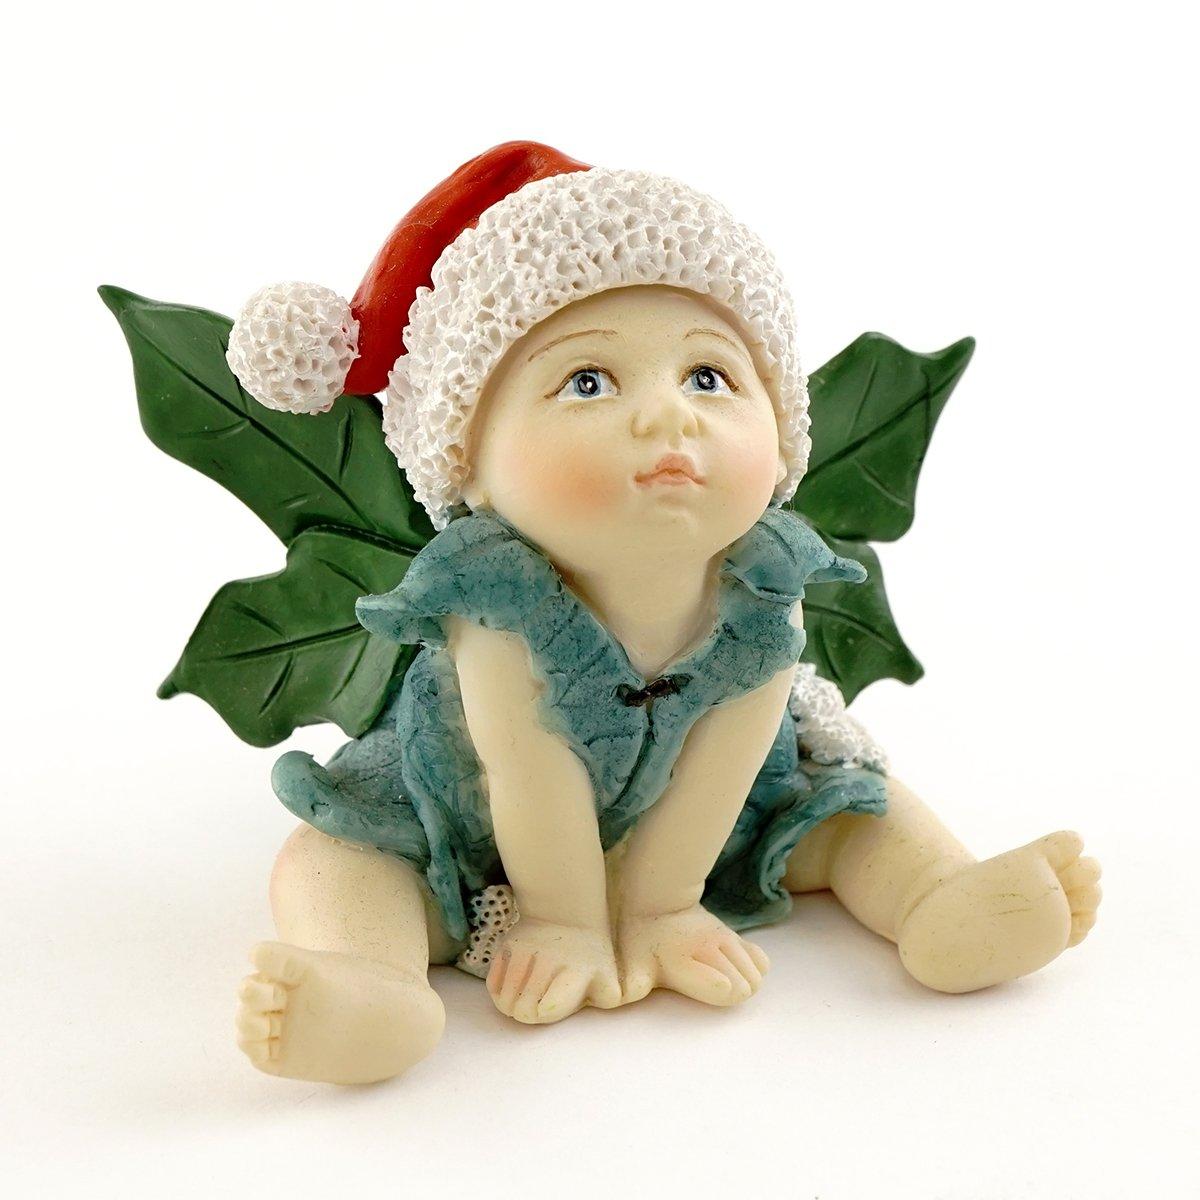 Top Collection Miniature Garden and Terrarium Christmas Fairy Baby Figurine